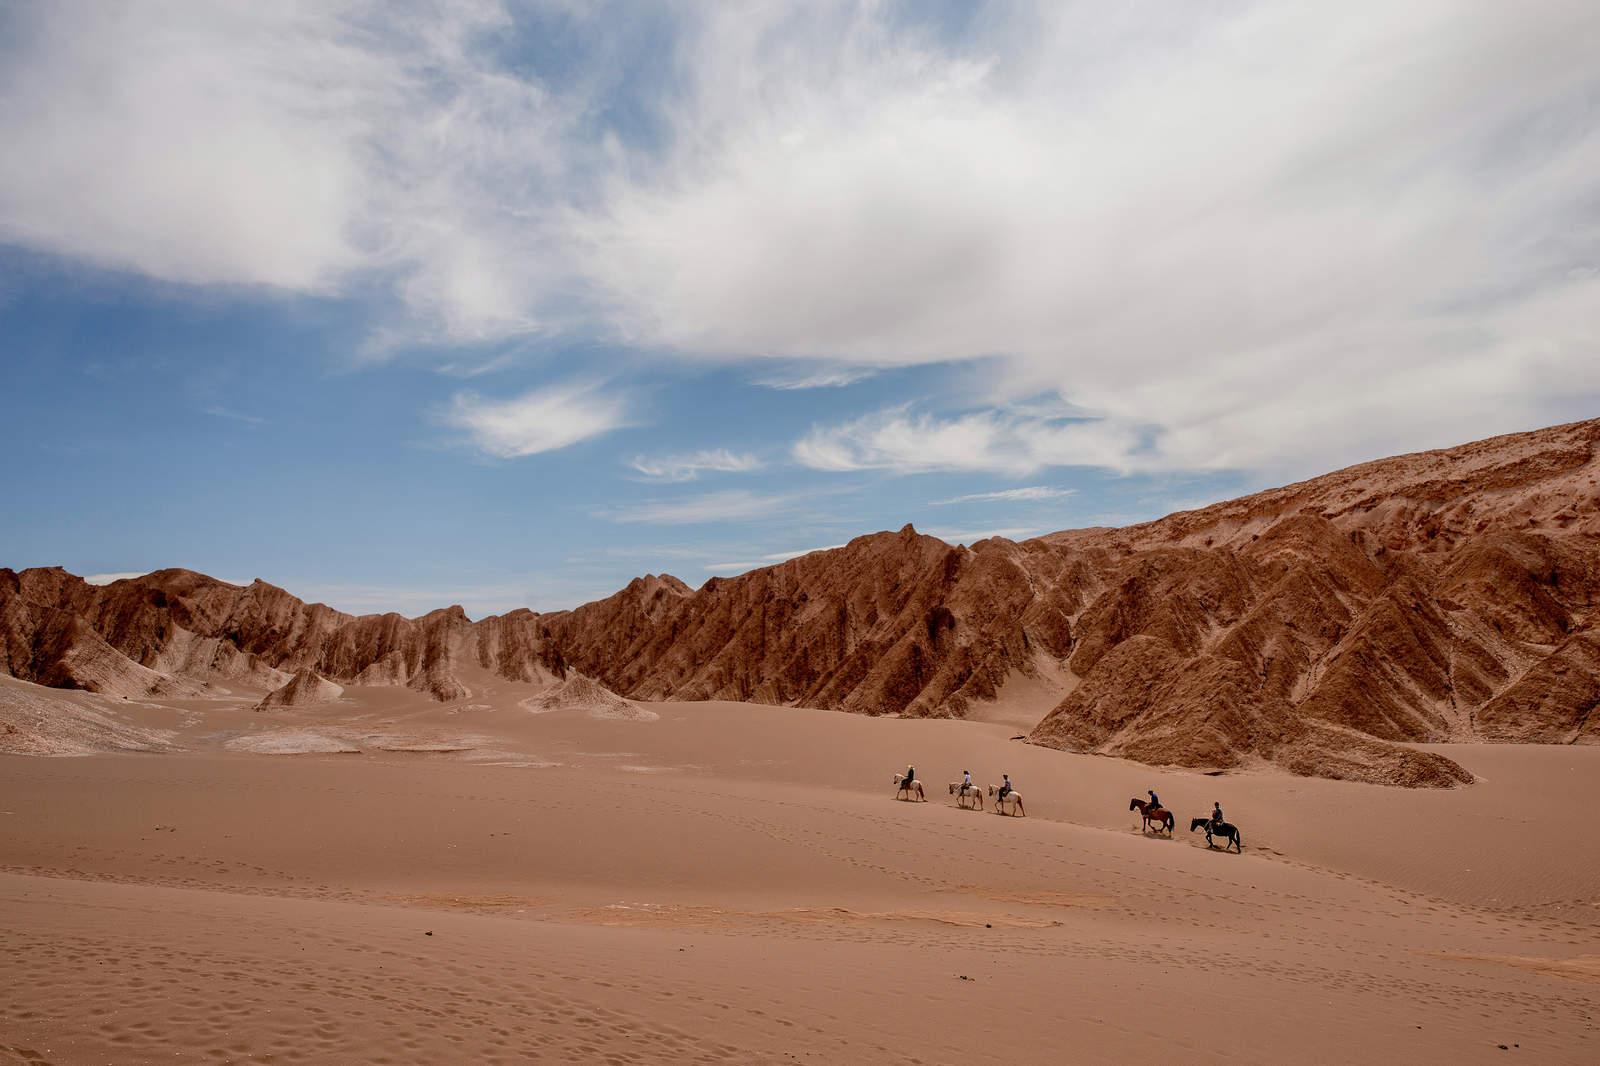 New York Times, κορυφαίοι προορισμοί, Ταξίδια, Χιλή